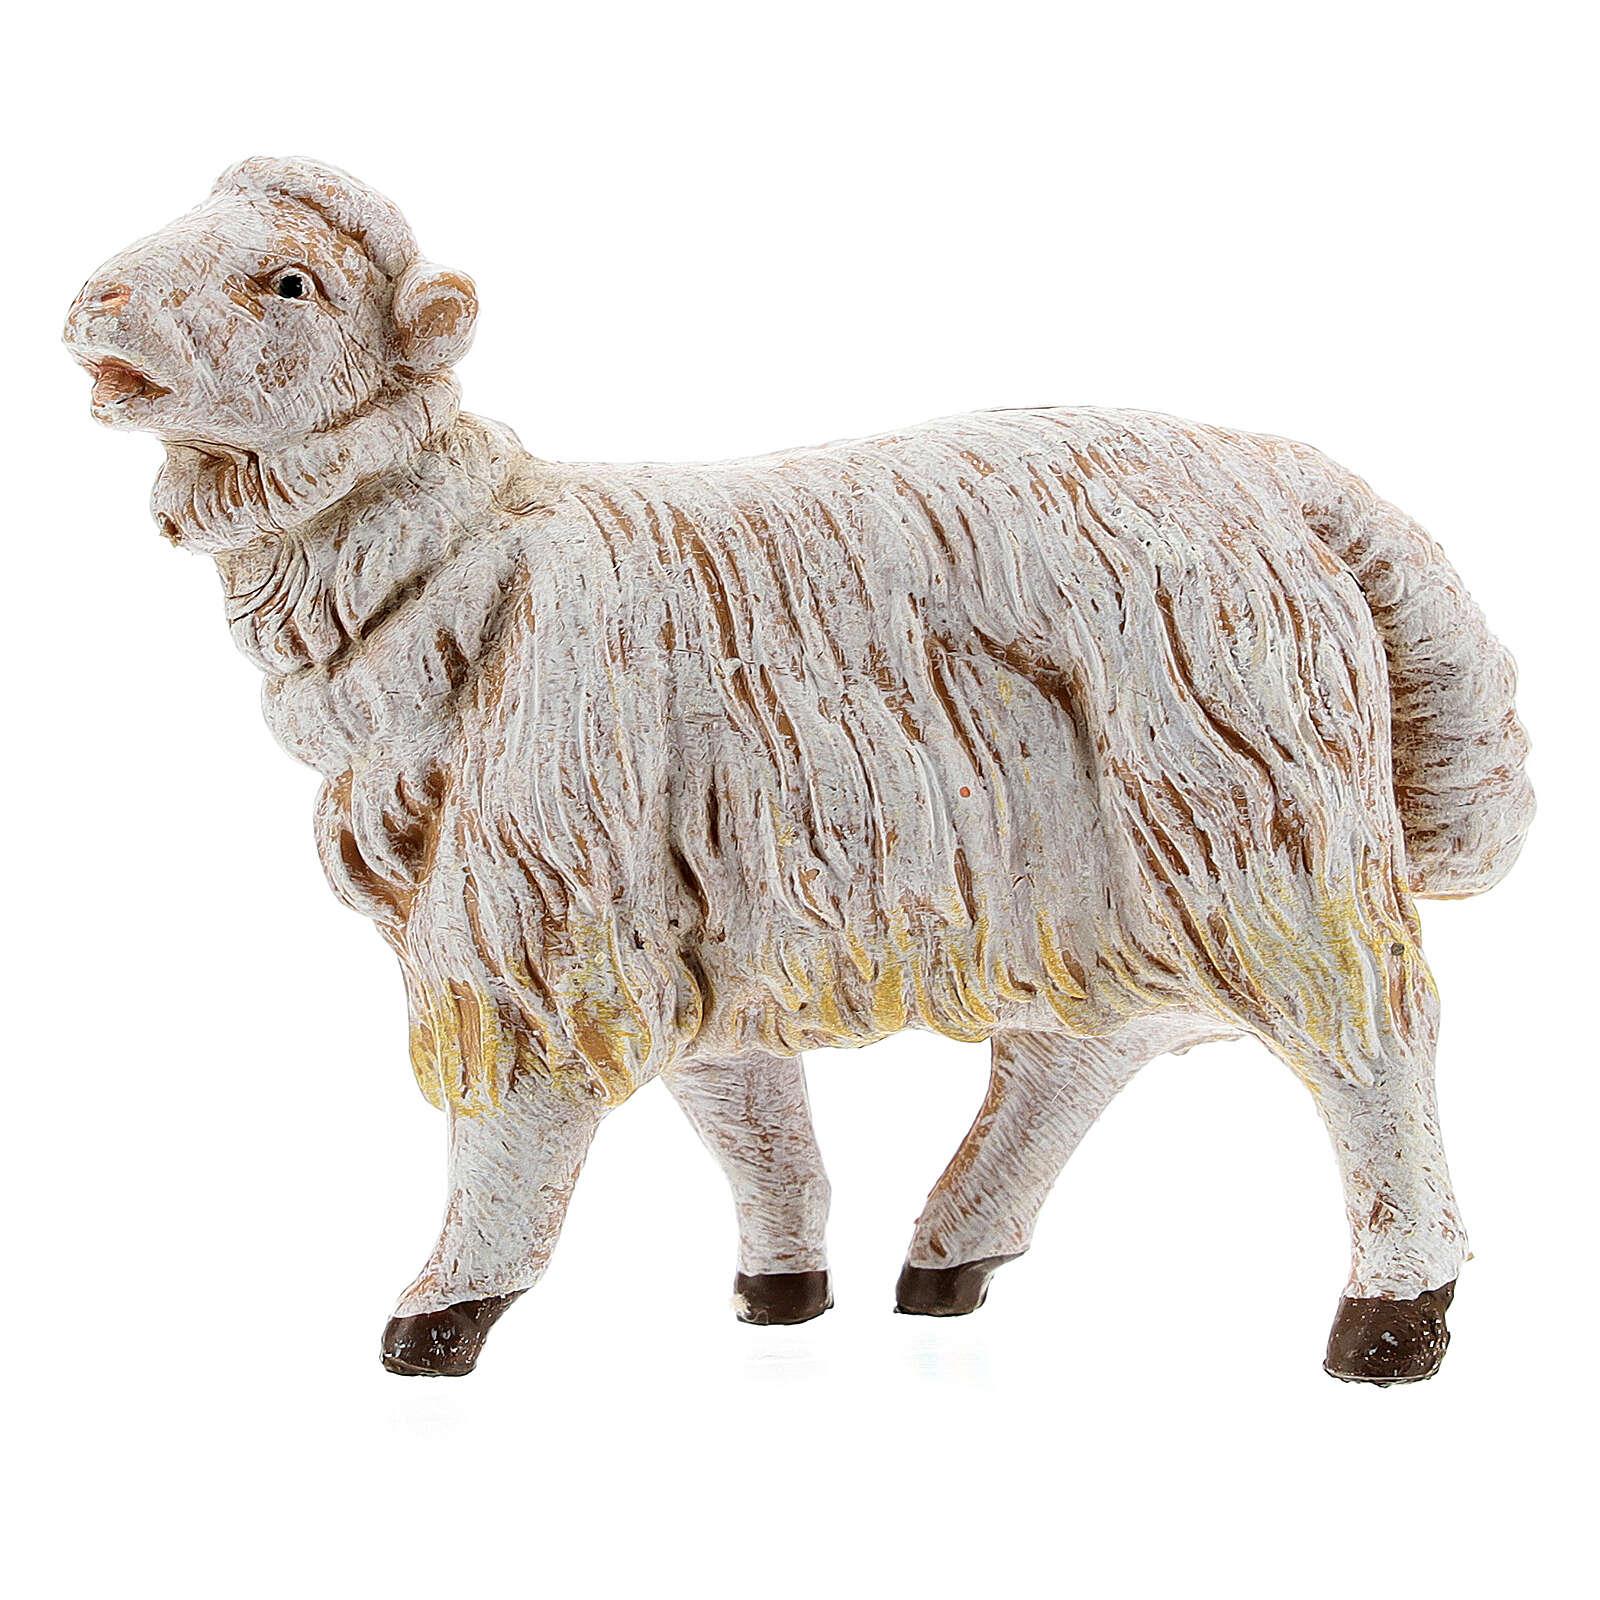 Pecore set 3 pezzi per presepe di altezza media 15 cm Fontanini 4